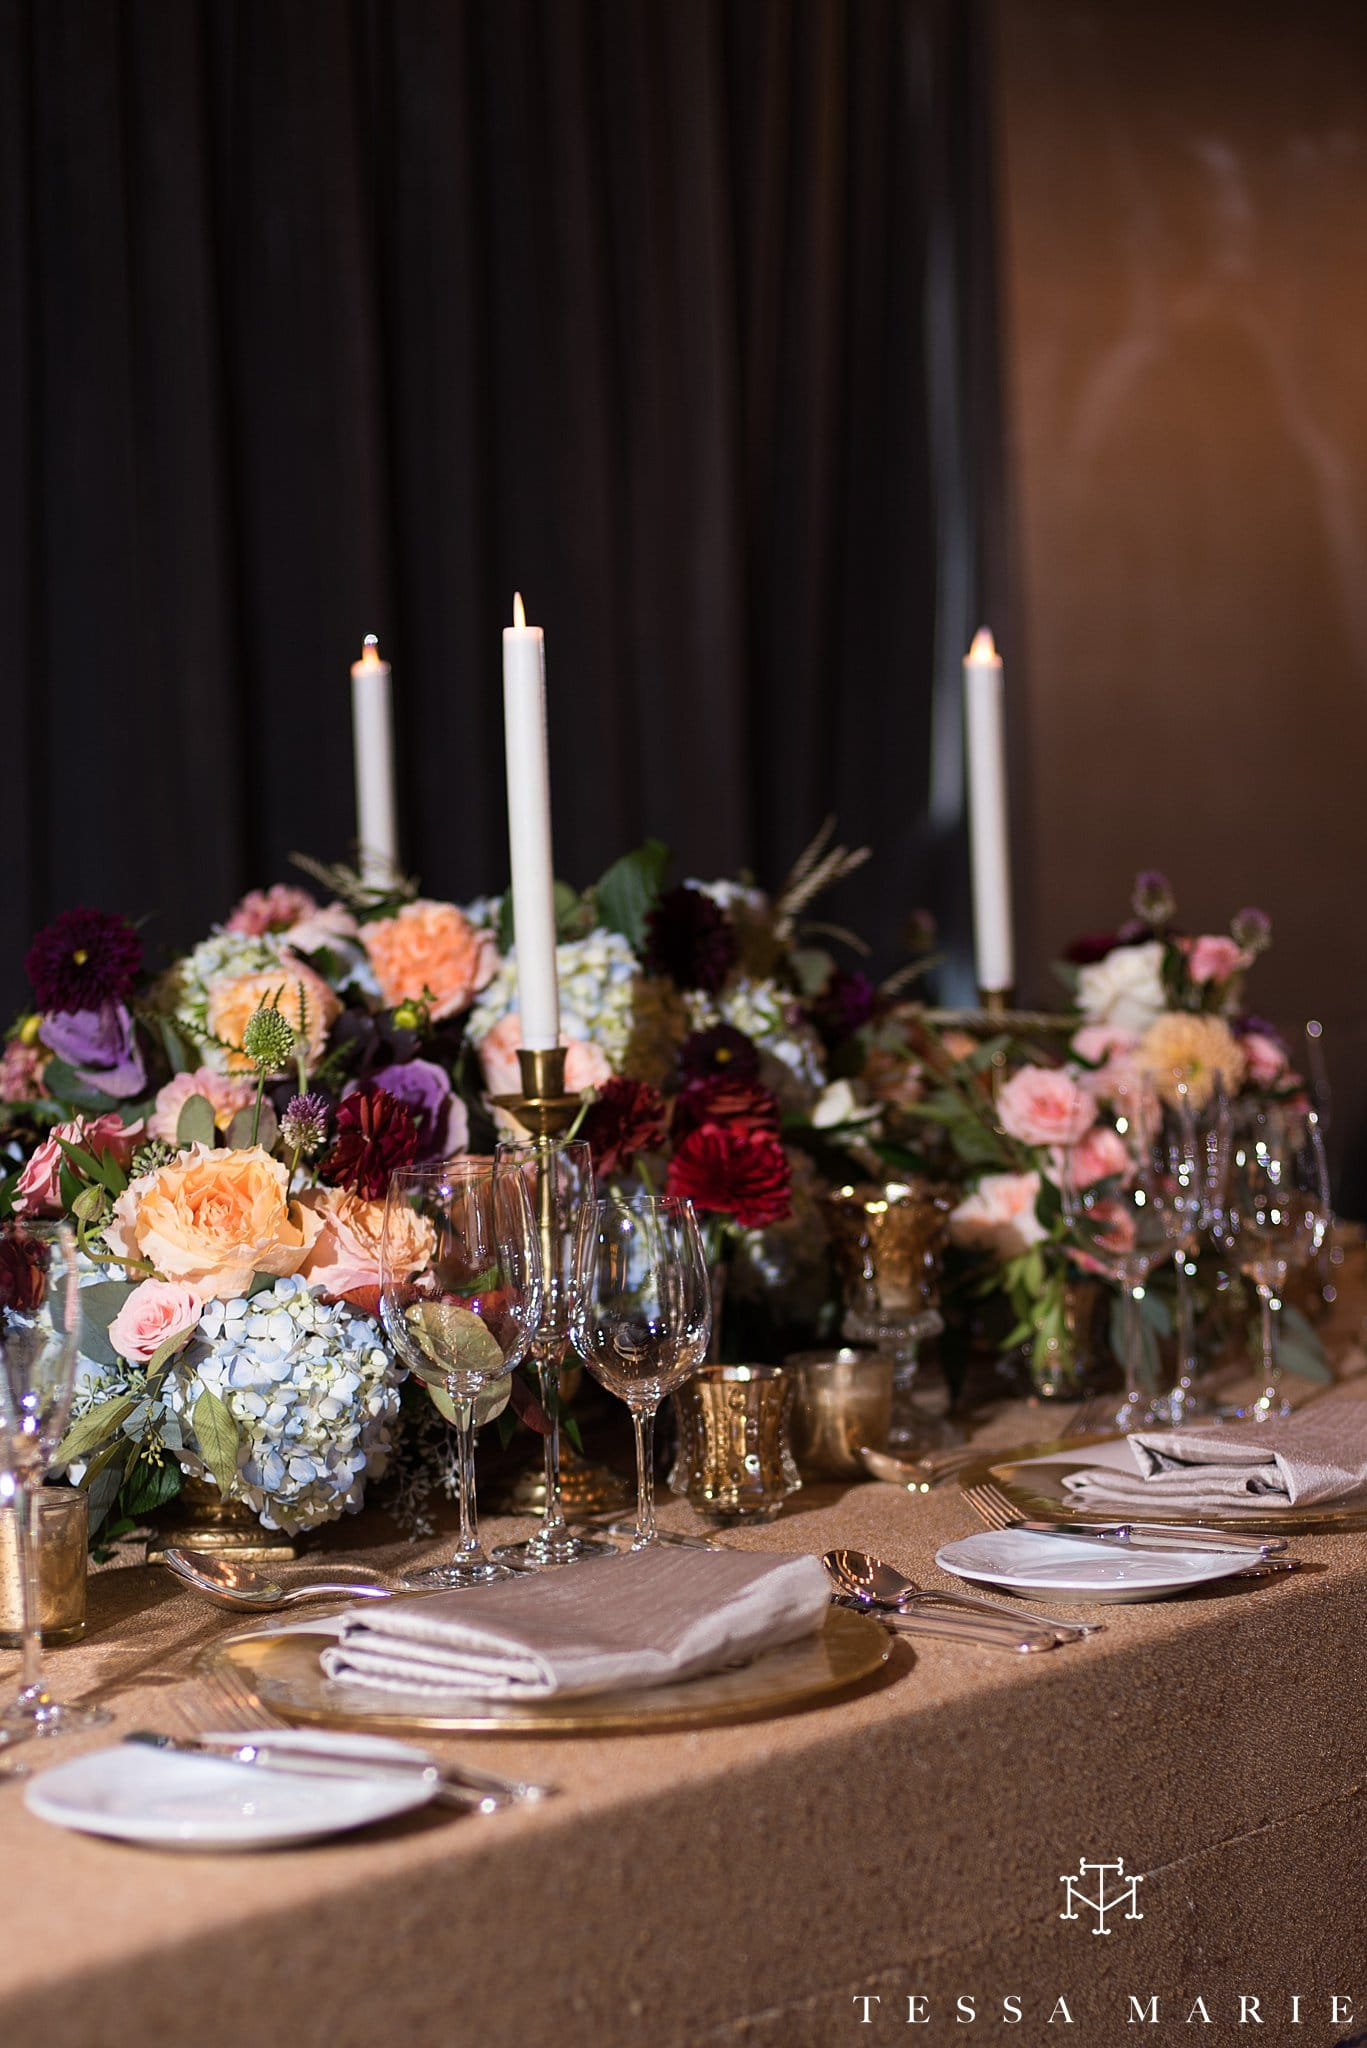 tessa_marie_Weddings_four_seasons_rehersal_dinner_pictures_wedding_atlanta_wedding_getting_married_0008.jpg